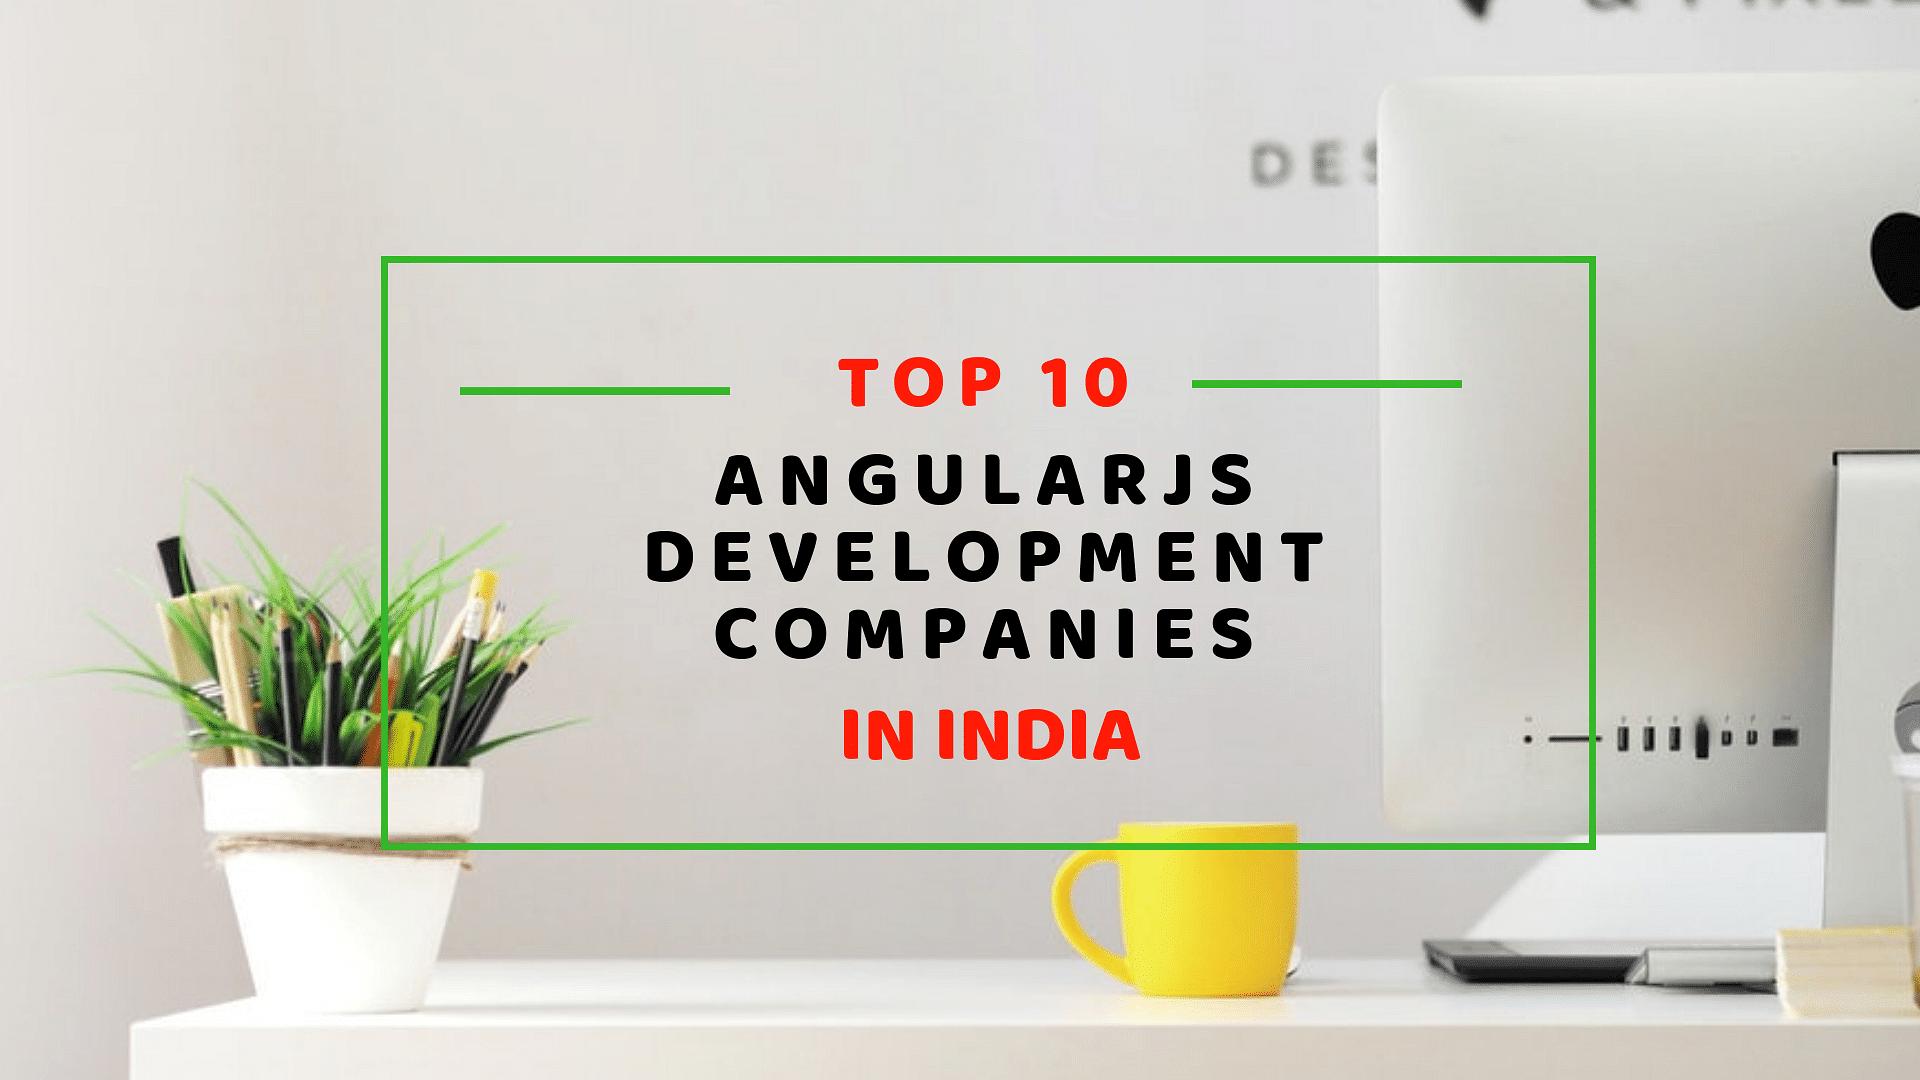 Top 10 AngularJS Development Companies in India